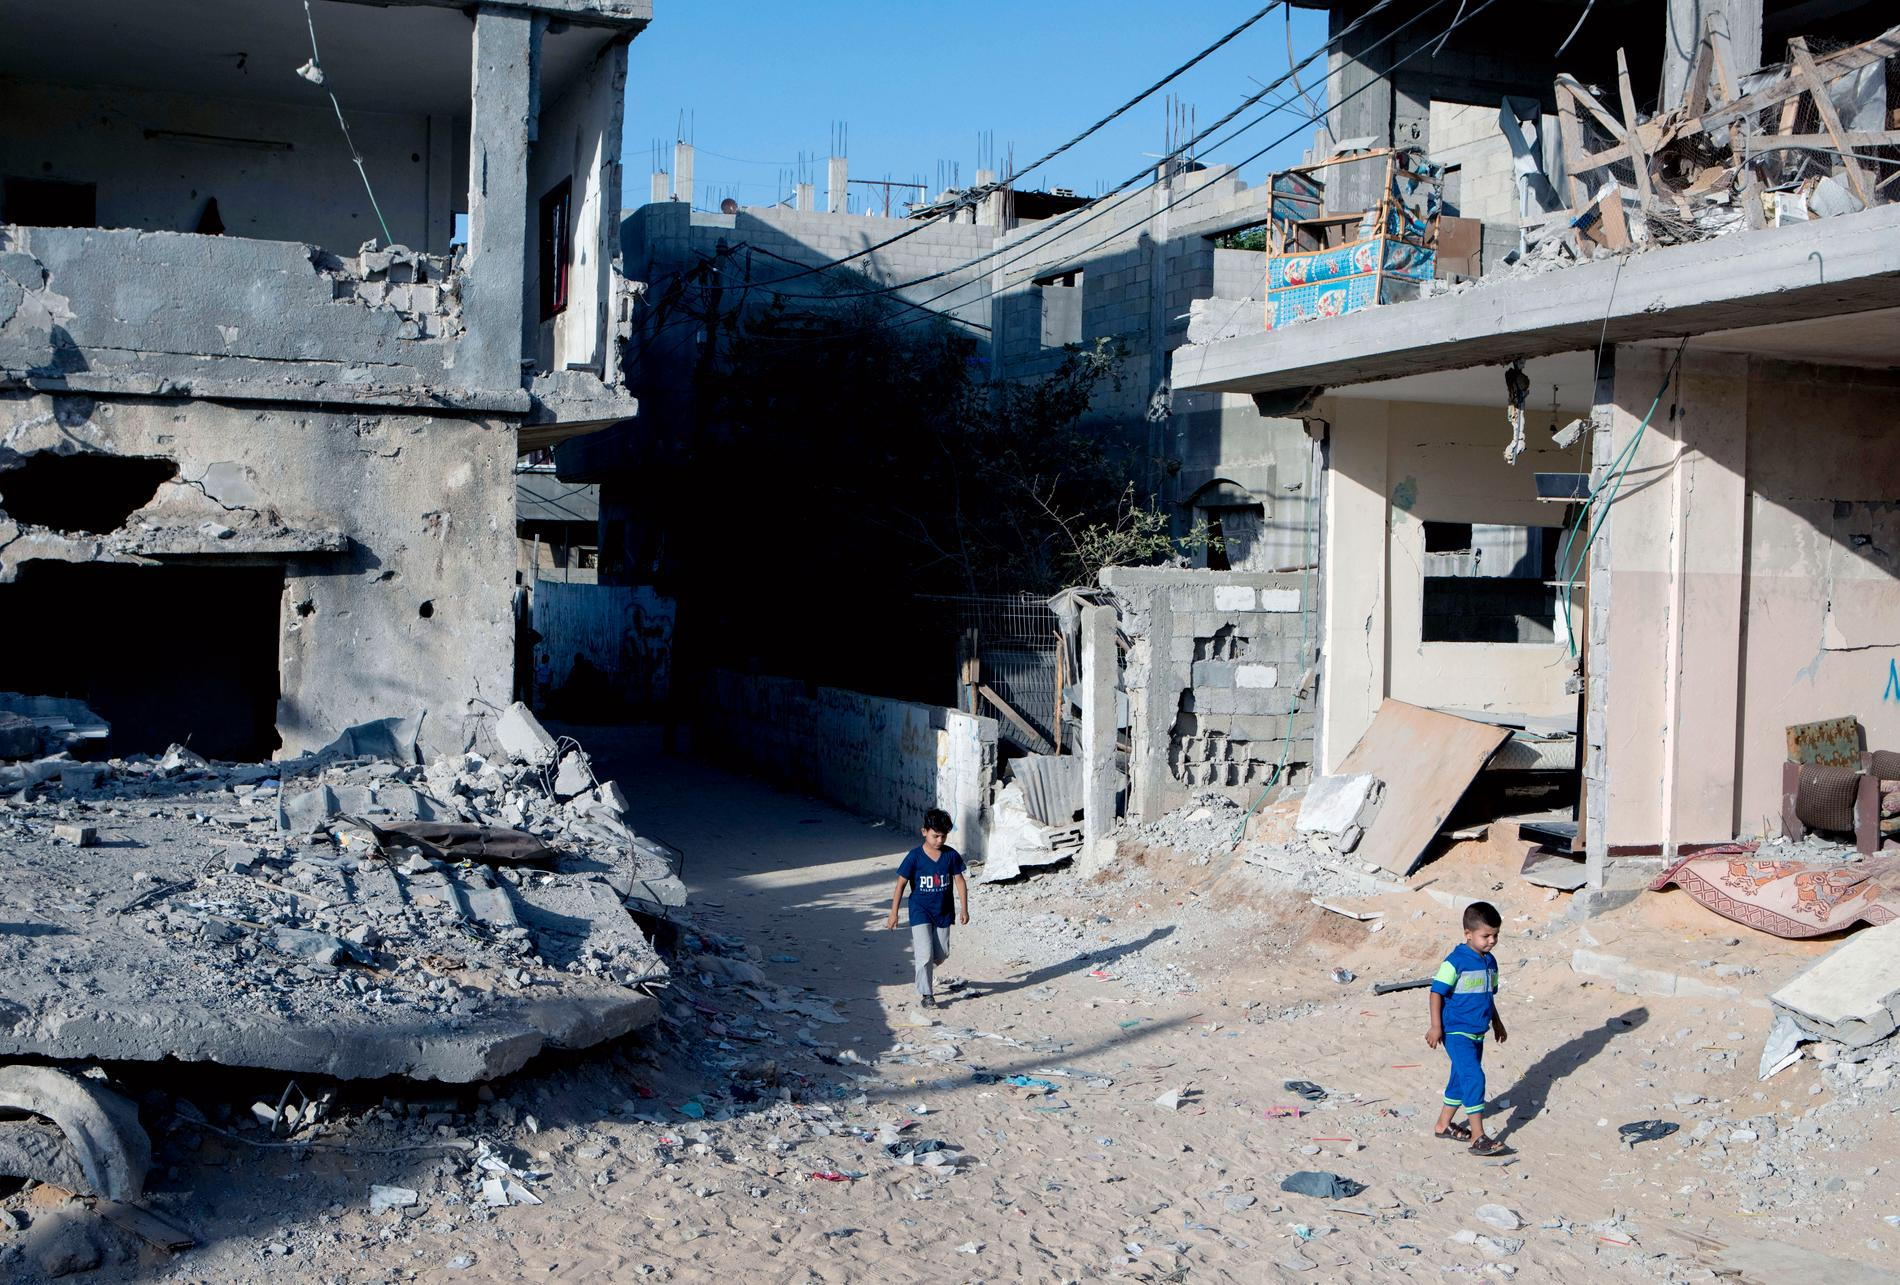 Barn bland ruinerna av bostadshusen i Beit Hanoun.